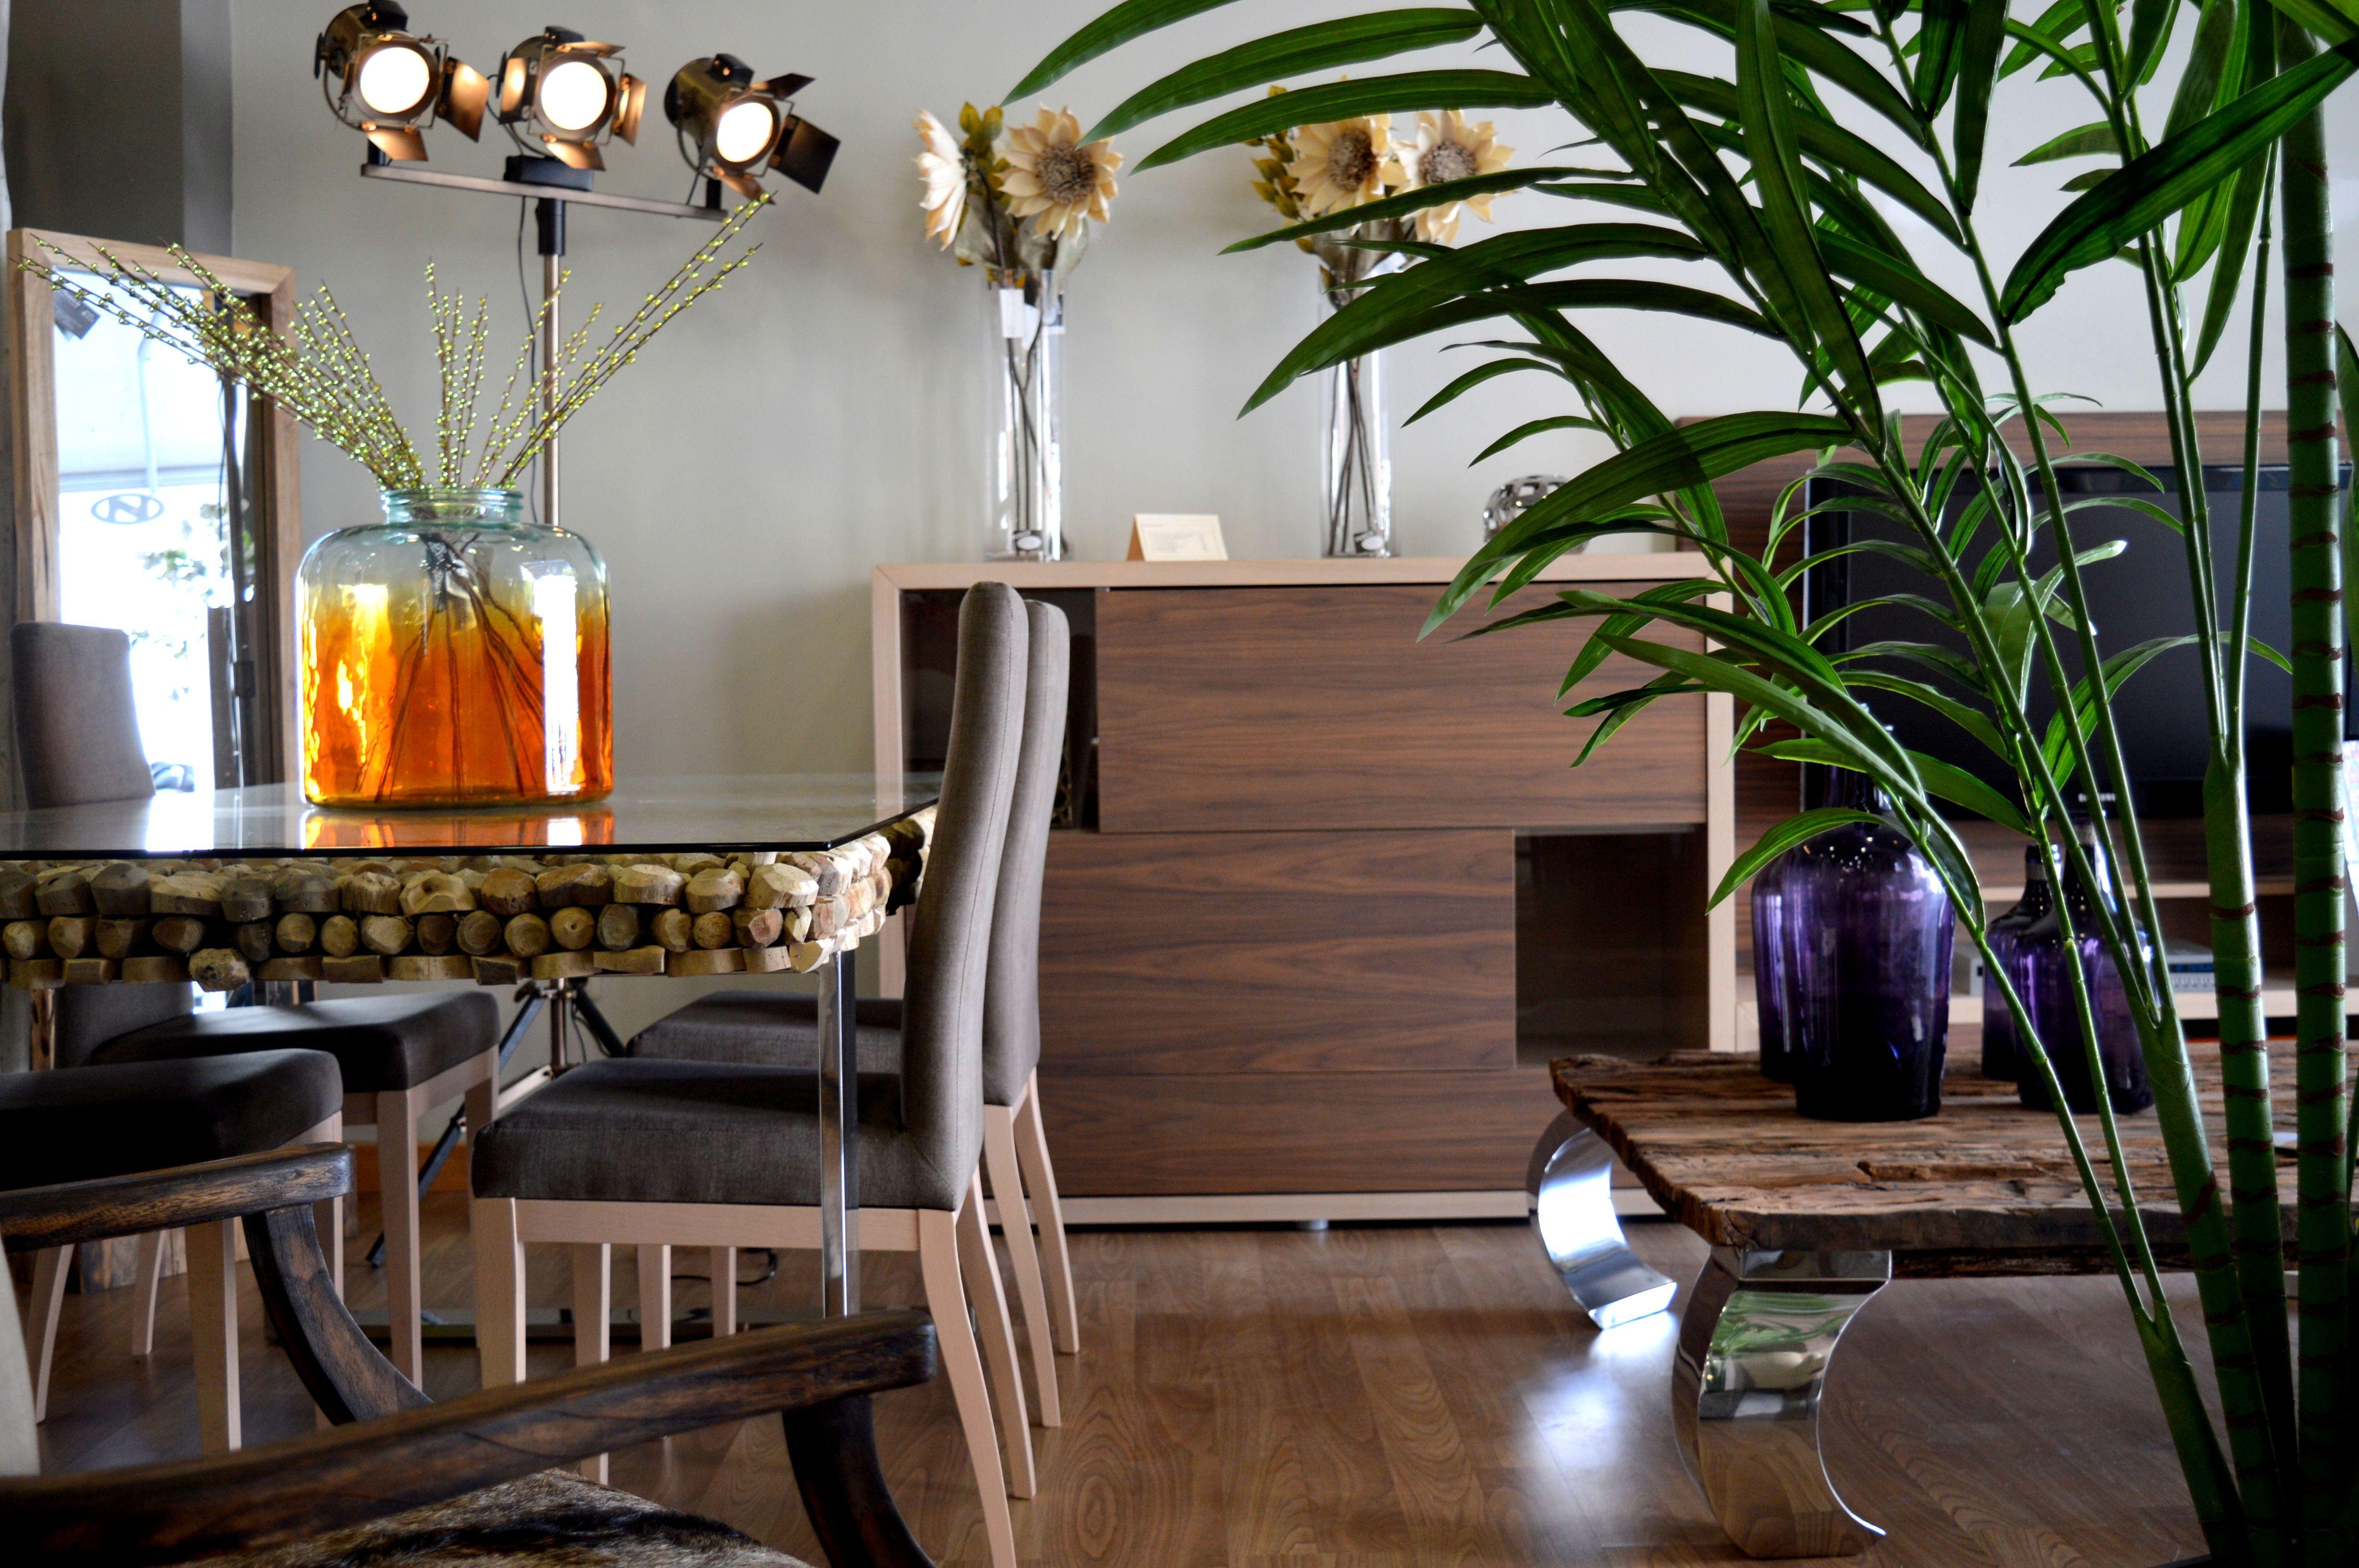 Muebles nusco pontevedra obtenga ideas dise o de muebles - Muebles de cocina pontevedra ...